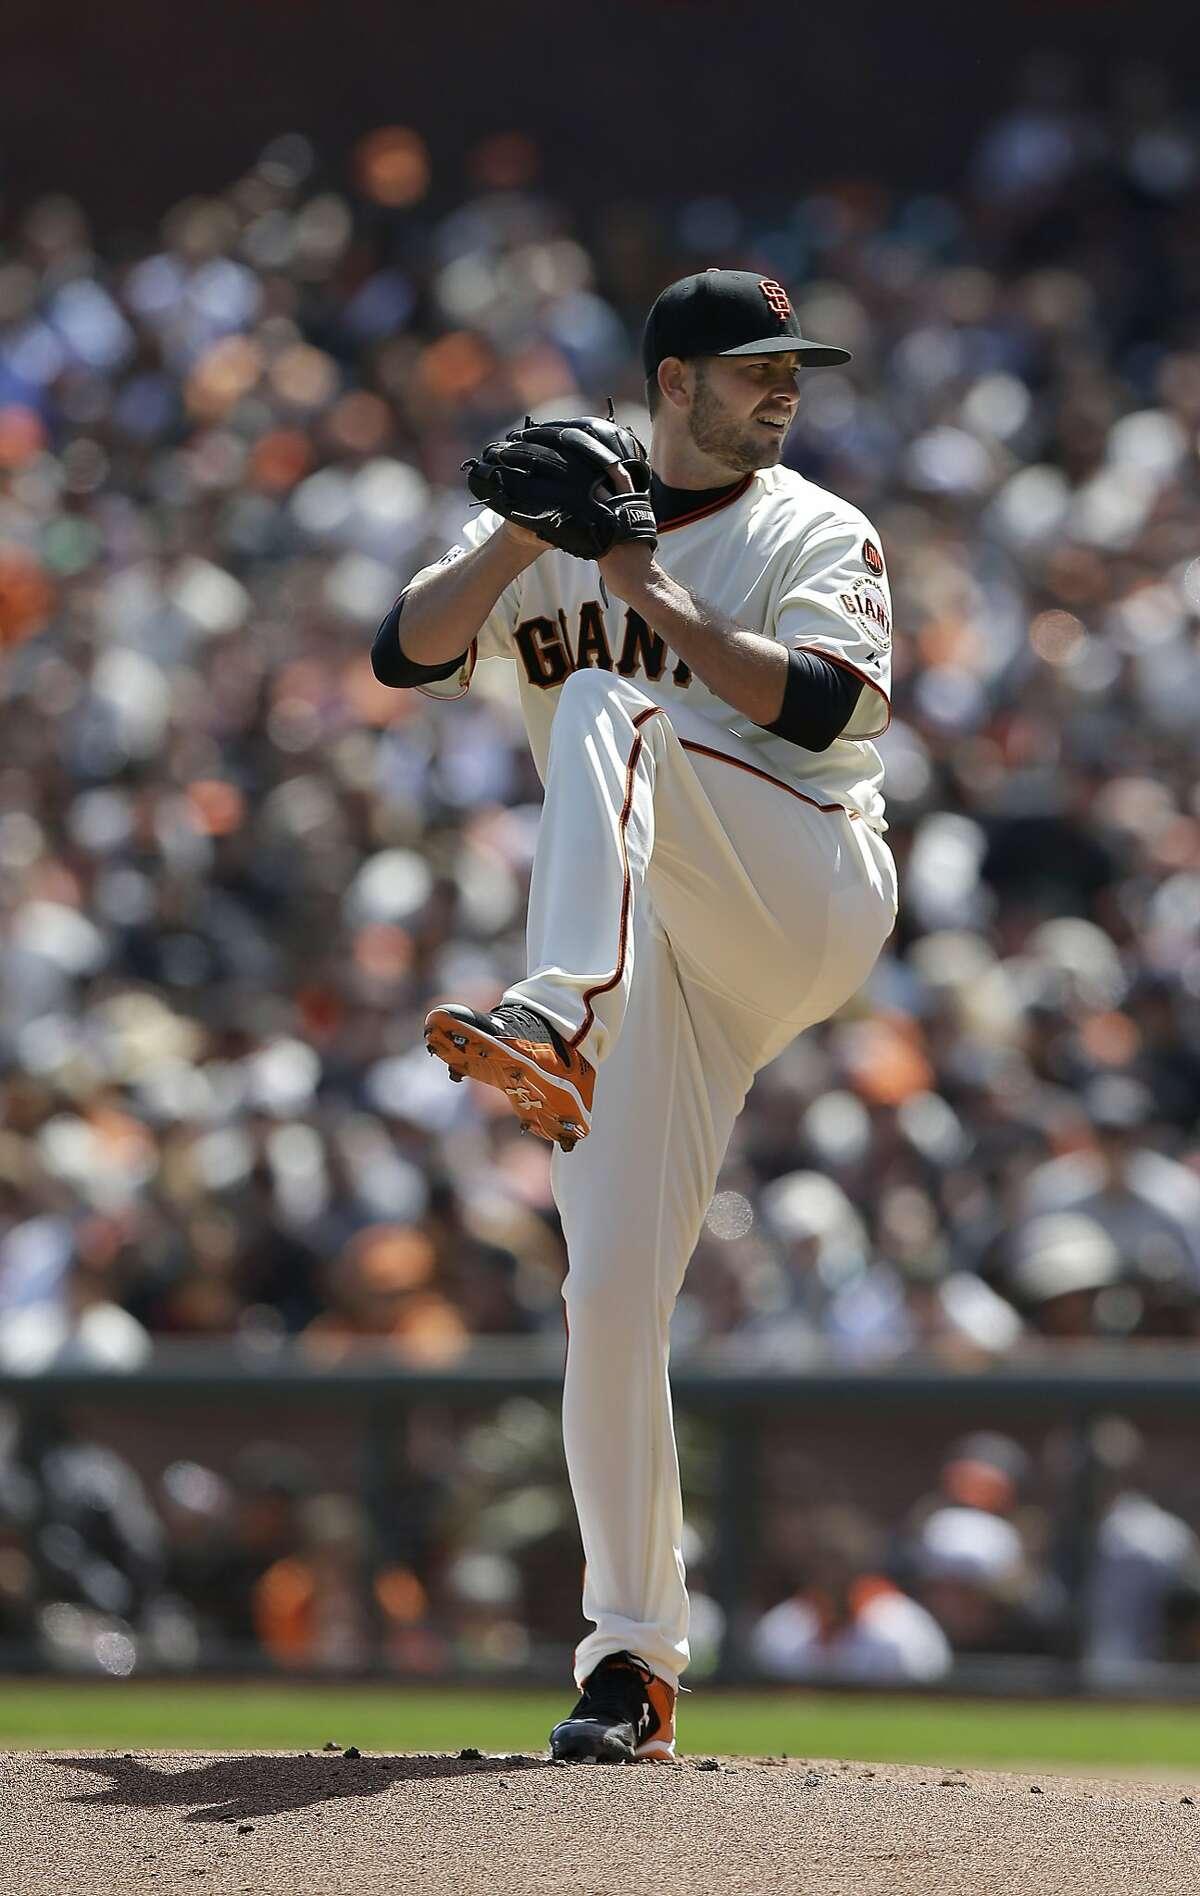 San Francisco Giants pitcher Chris Heston throws against the Colorado Rockies during a baseball game in San Francisco, Monday, April 13, 2015. (AP Photo/Jeff Chiu)